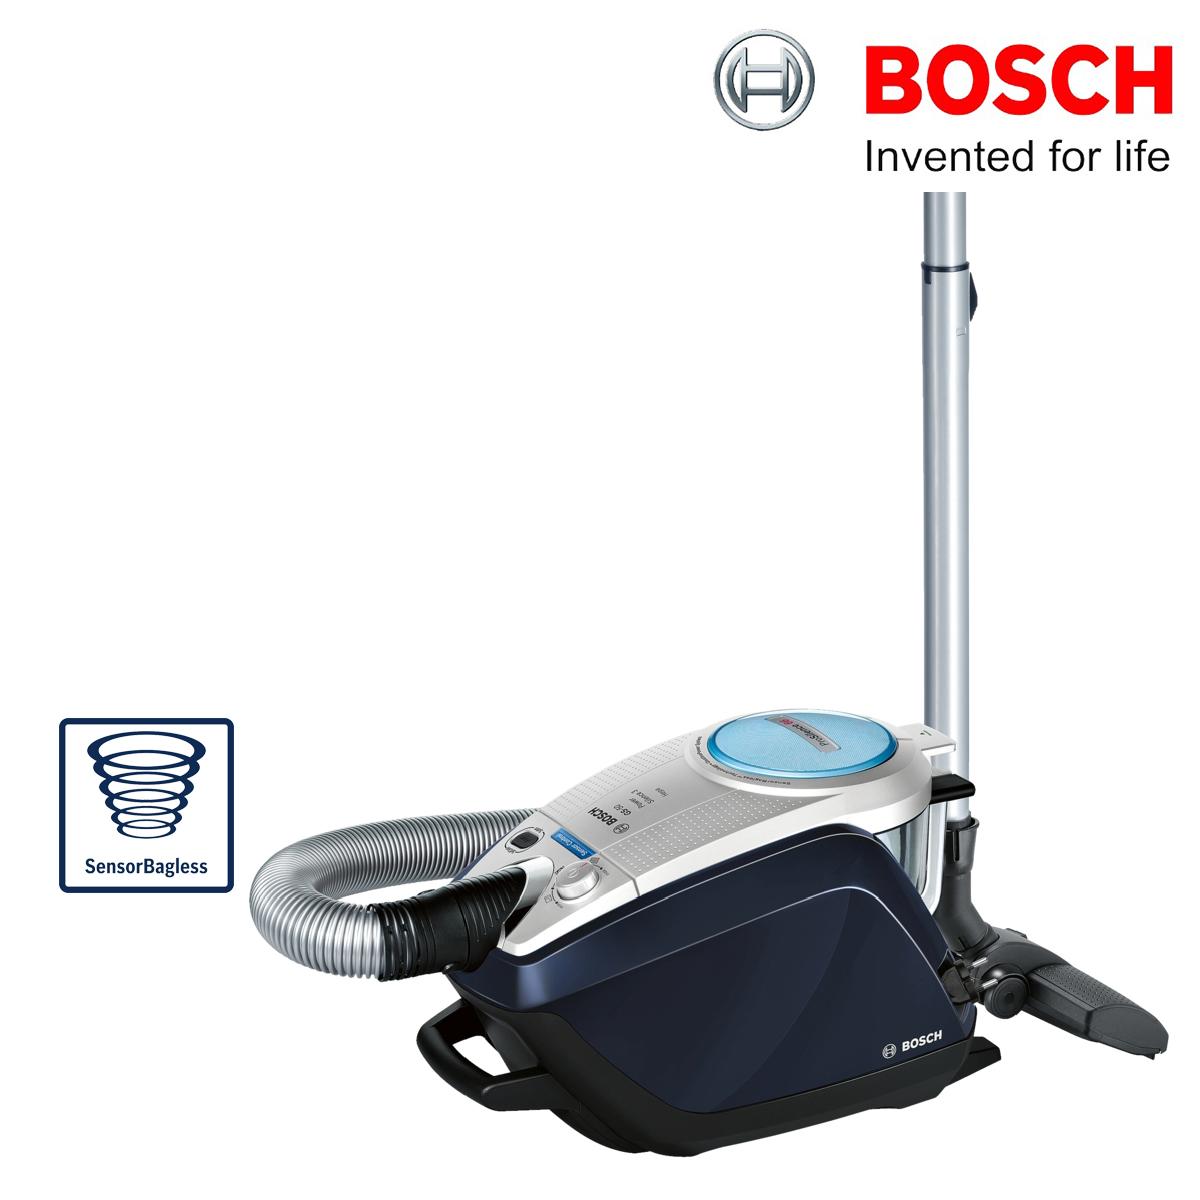 bosch bgs5scsigb pro silence 66 relaxx sensor vacuum cleaner bagless ebay. Black Bedroom Furniture Sets. Home Design Ideas